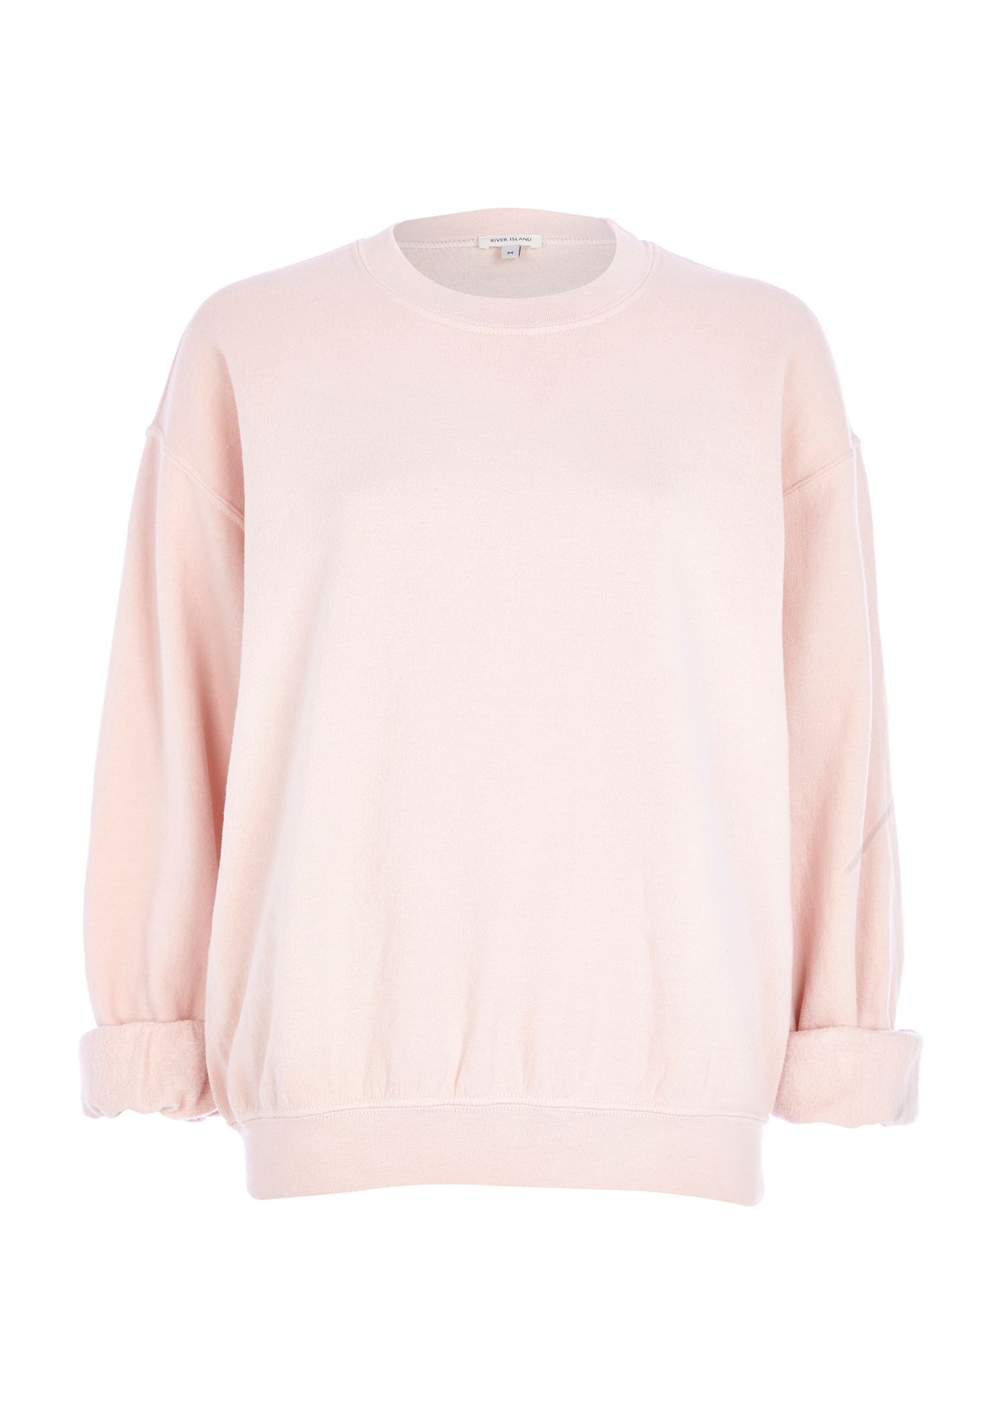 river-island-pink-light-pink-brushed-oversized-sweatshirt-product-1-19065258-1-684640461-normal.jpg